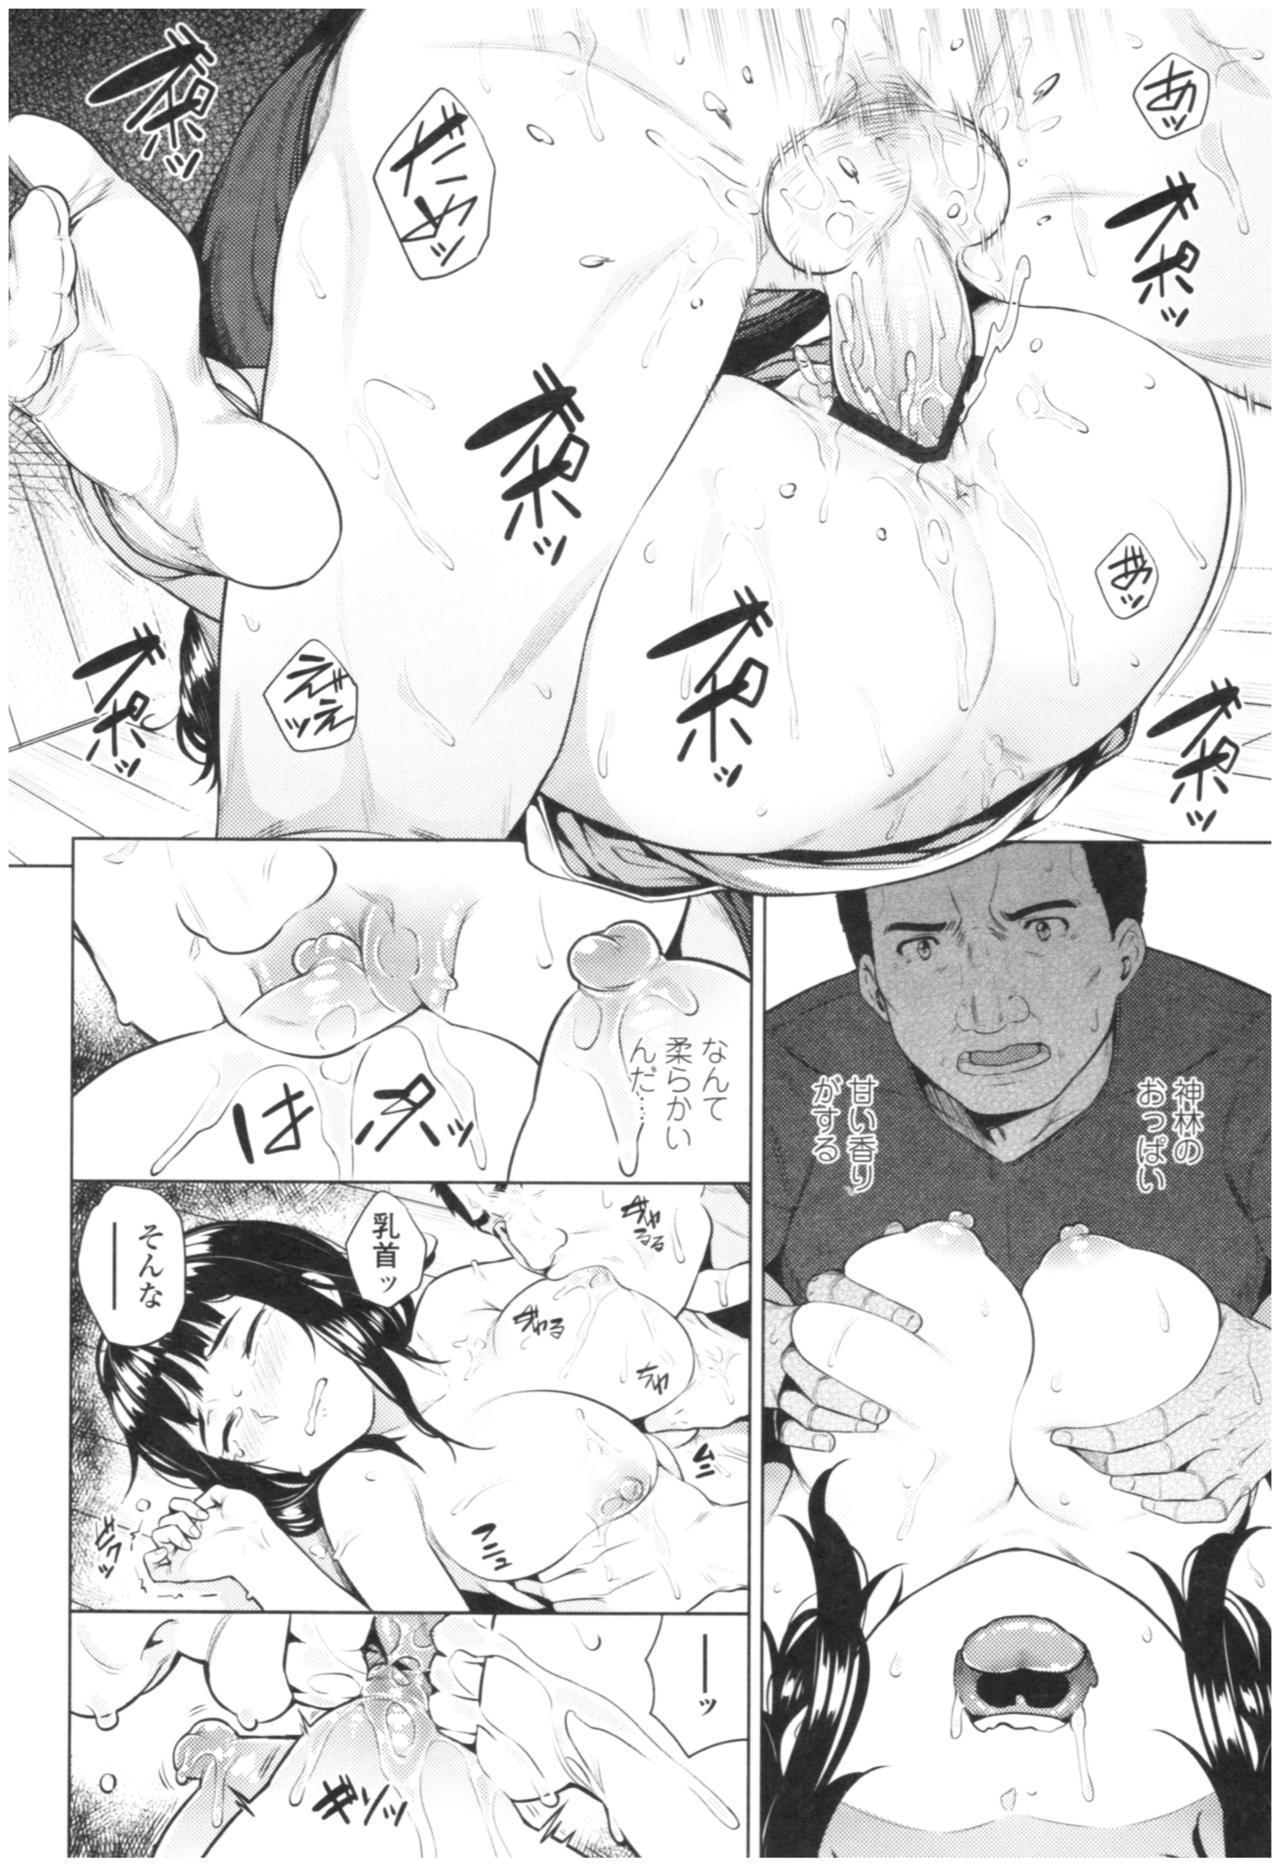 Bitch Kanojo no Hatsukoi Jouji - Her Lewd First Love and SEX 65